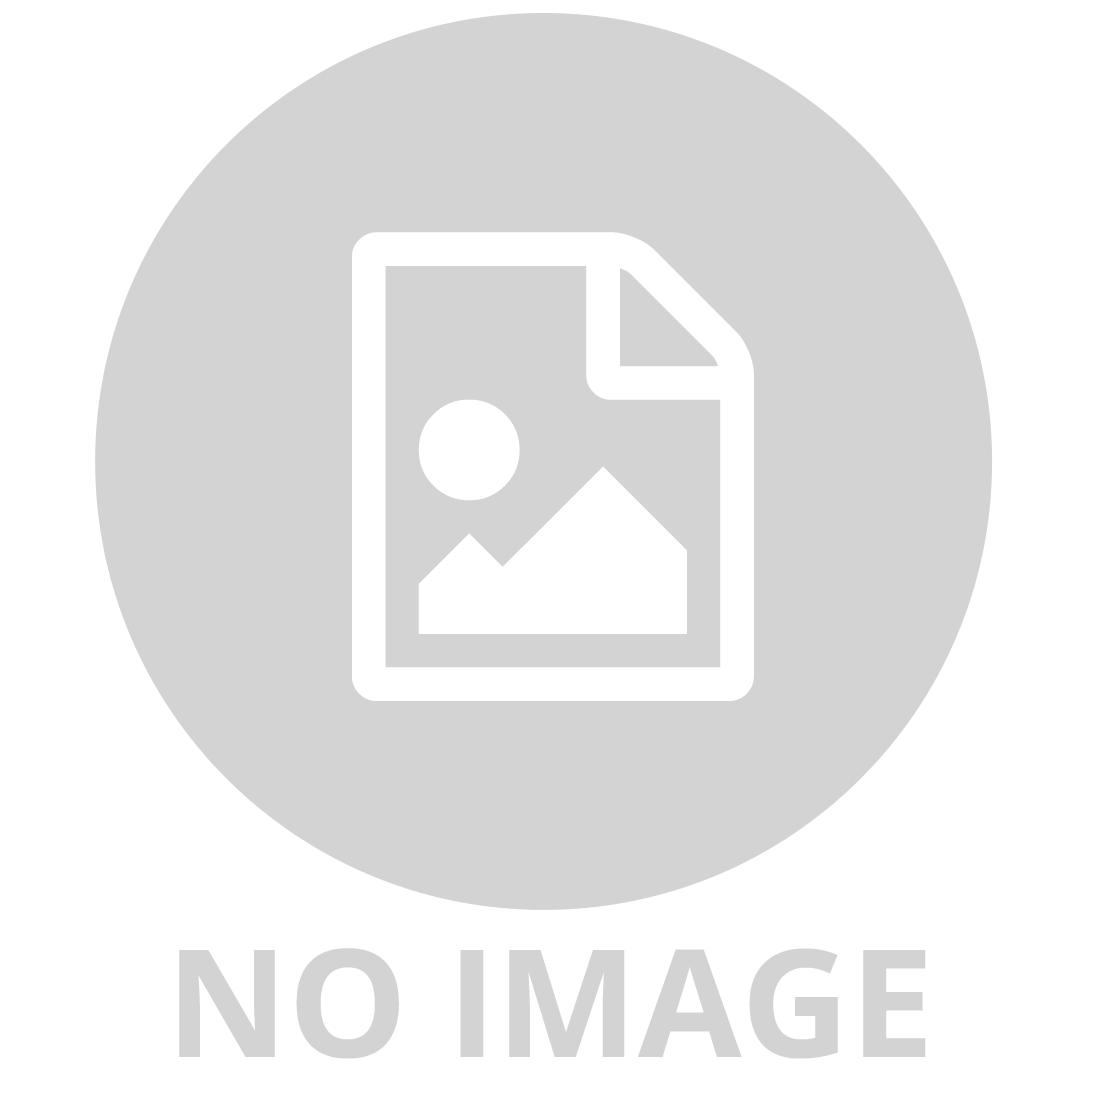 CB SKY 10 NOTE HARMONICA